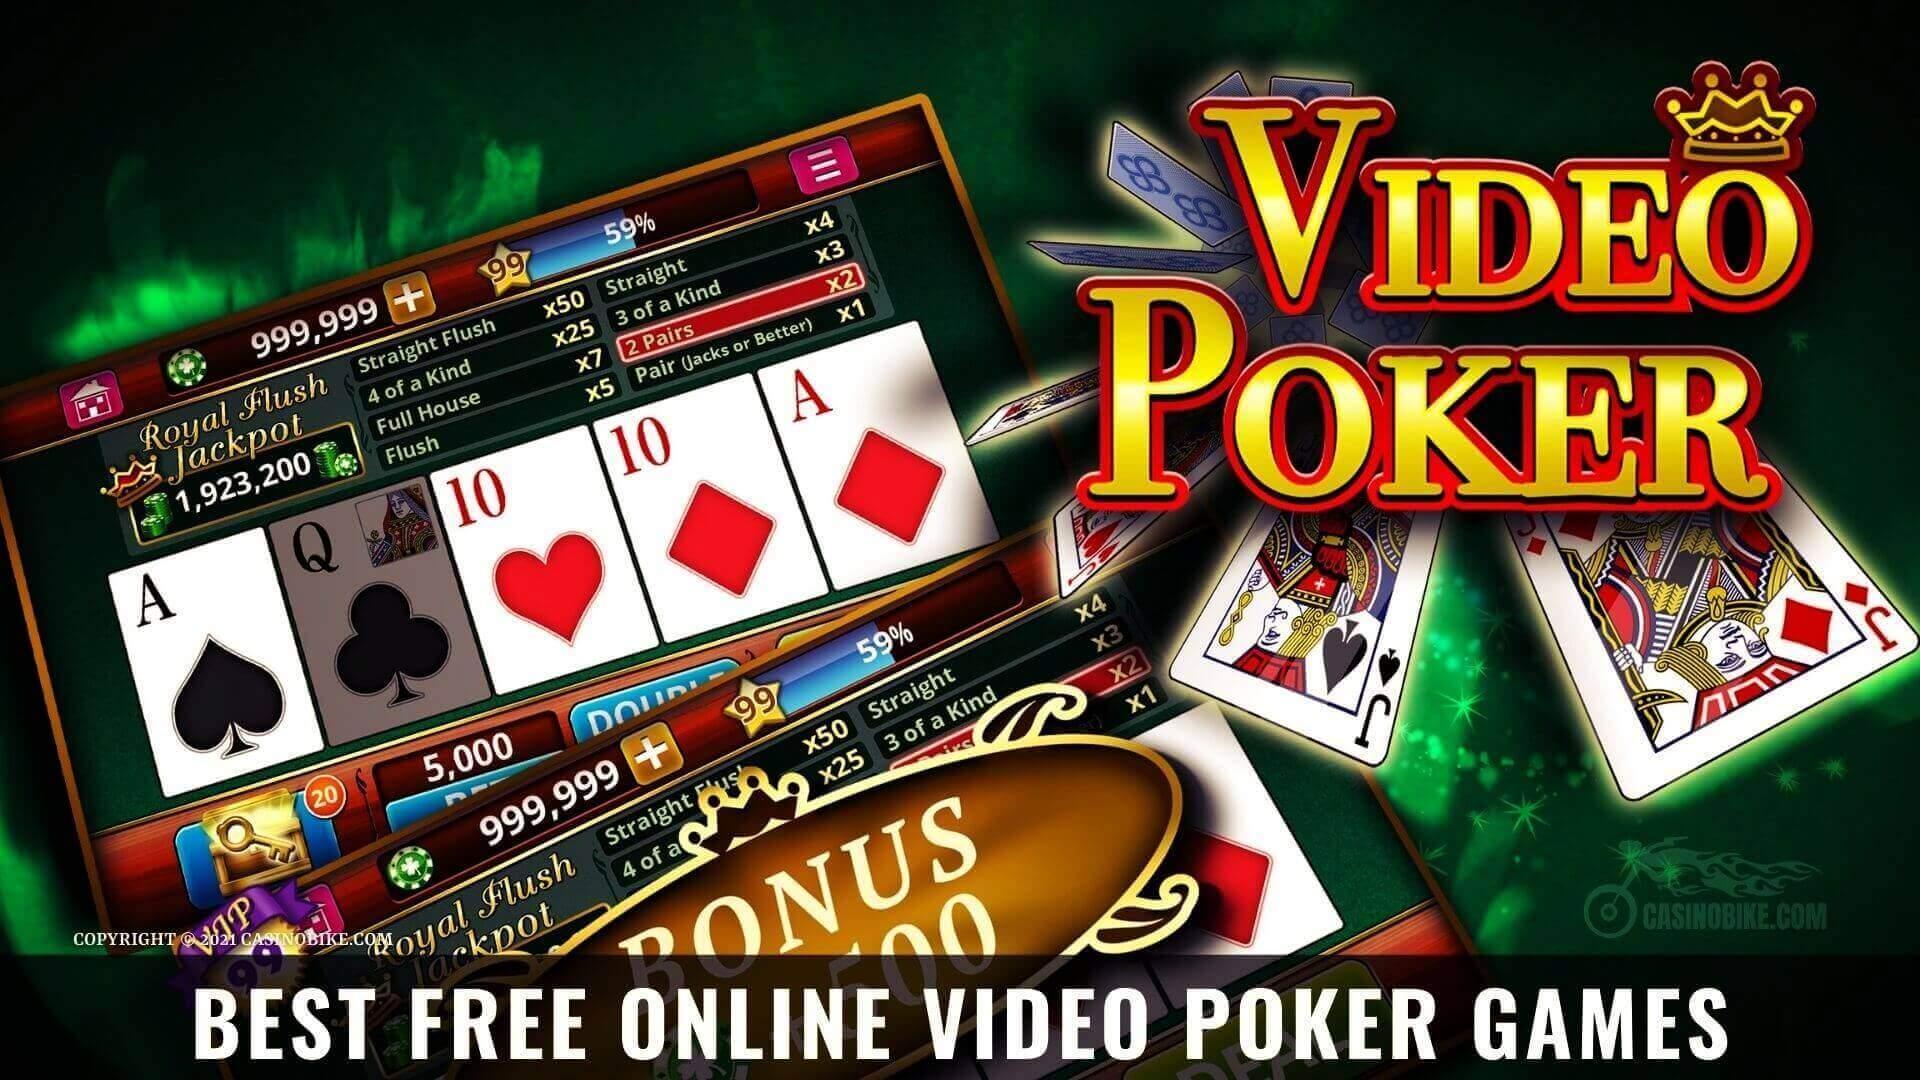 Best Free Online Video Poker Games